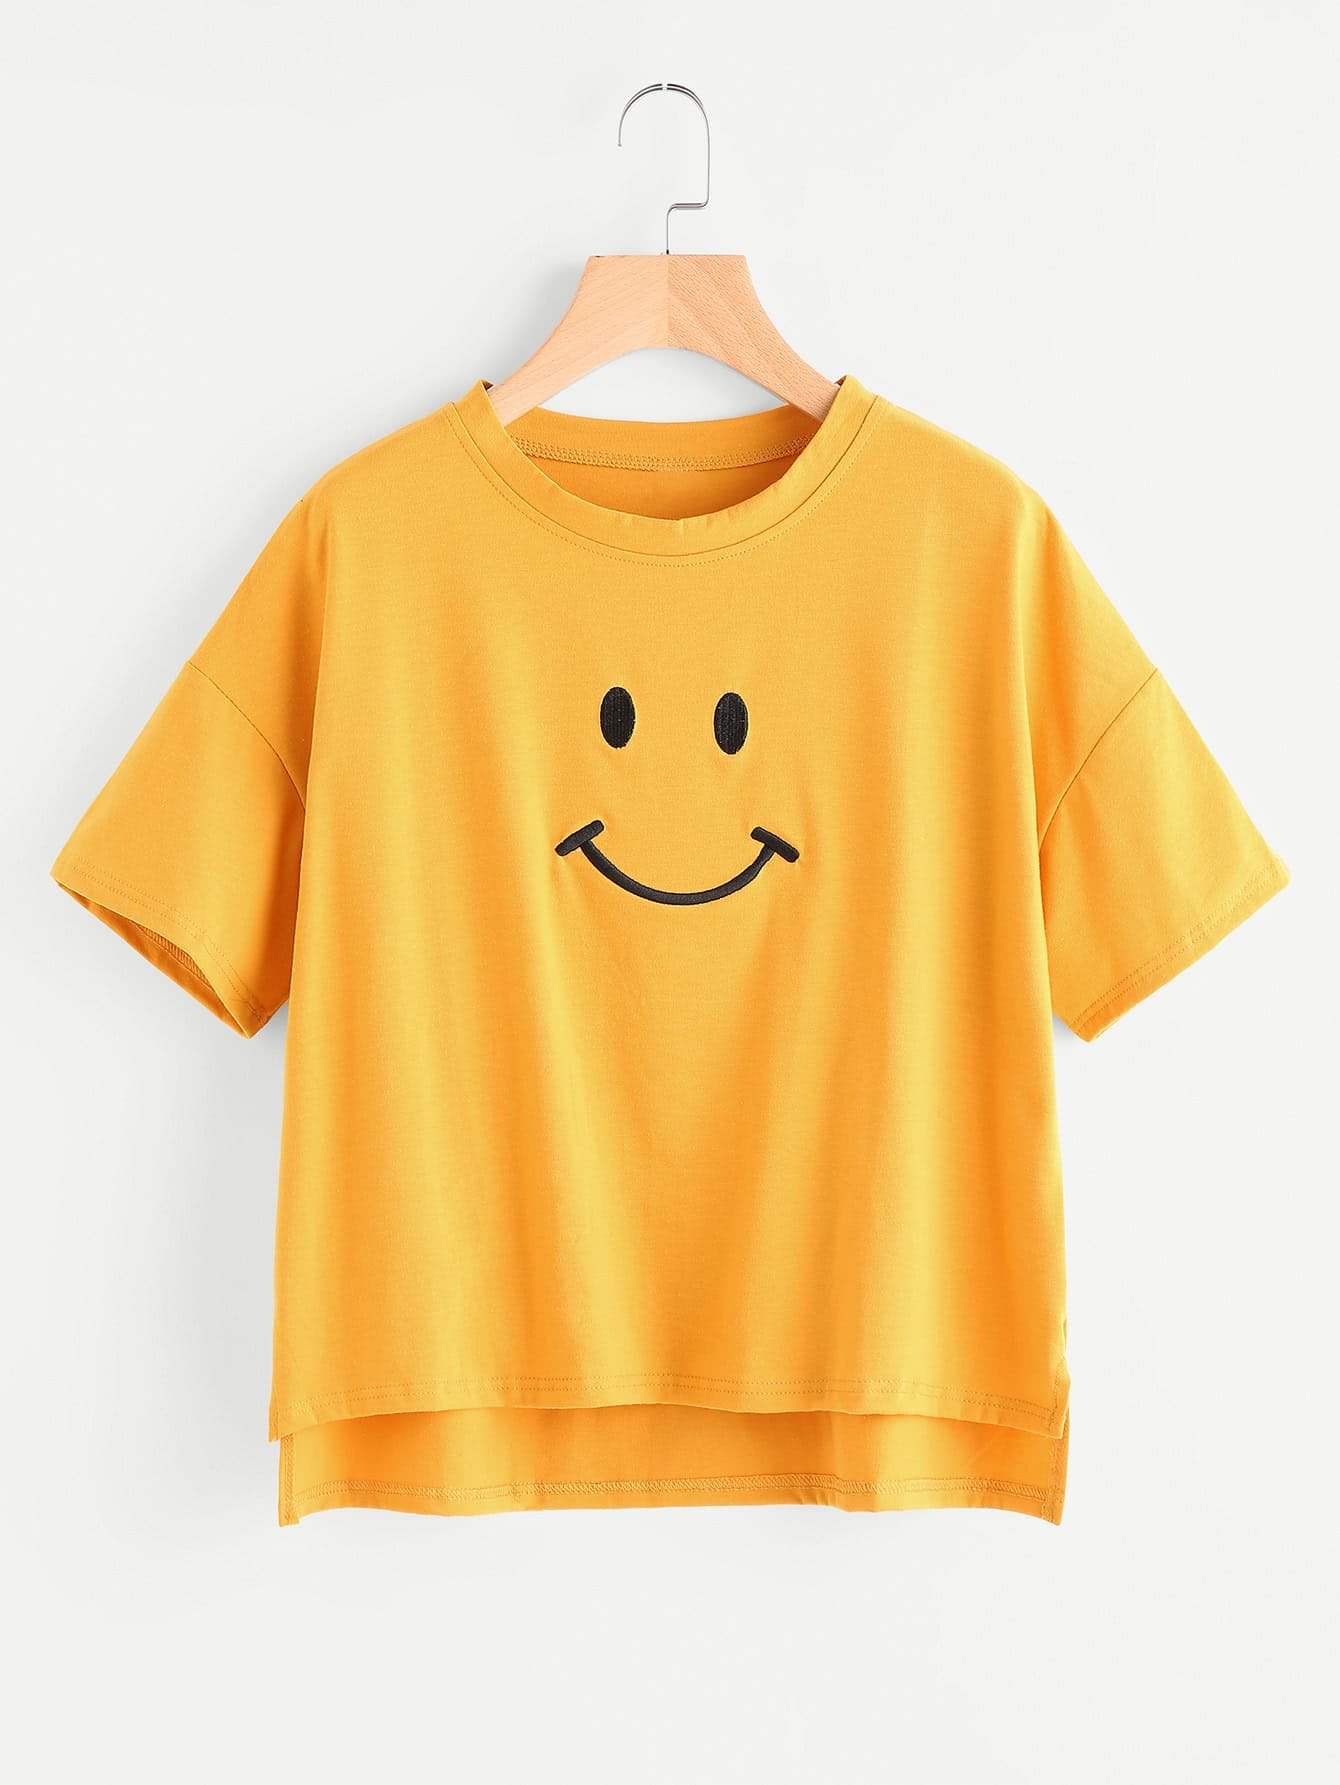 Dip Hem Smile Print Tee allover skull print dip hem tee